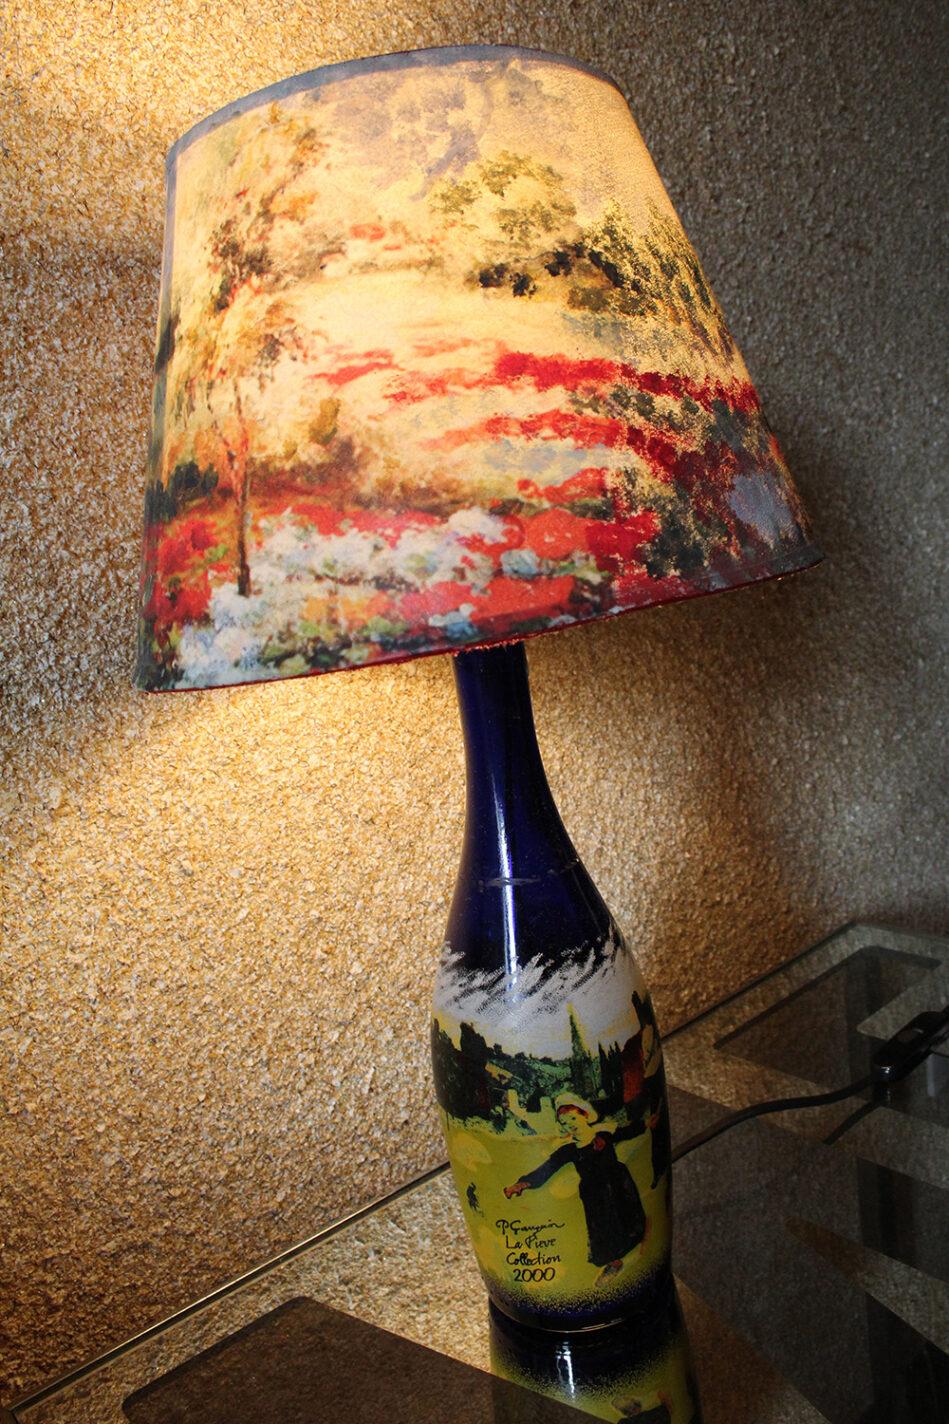 Kunstzinnige bedlampjes in onze kamer van B&B La Perla Blu